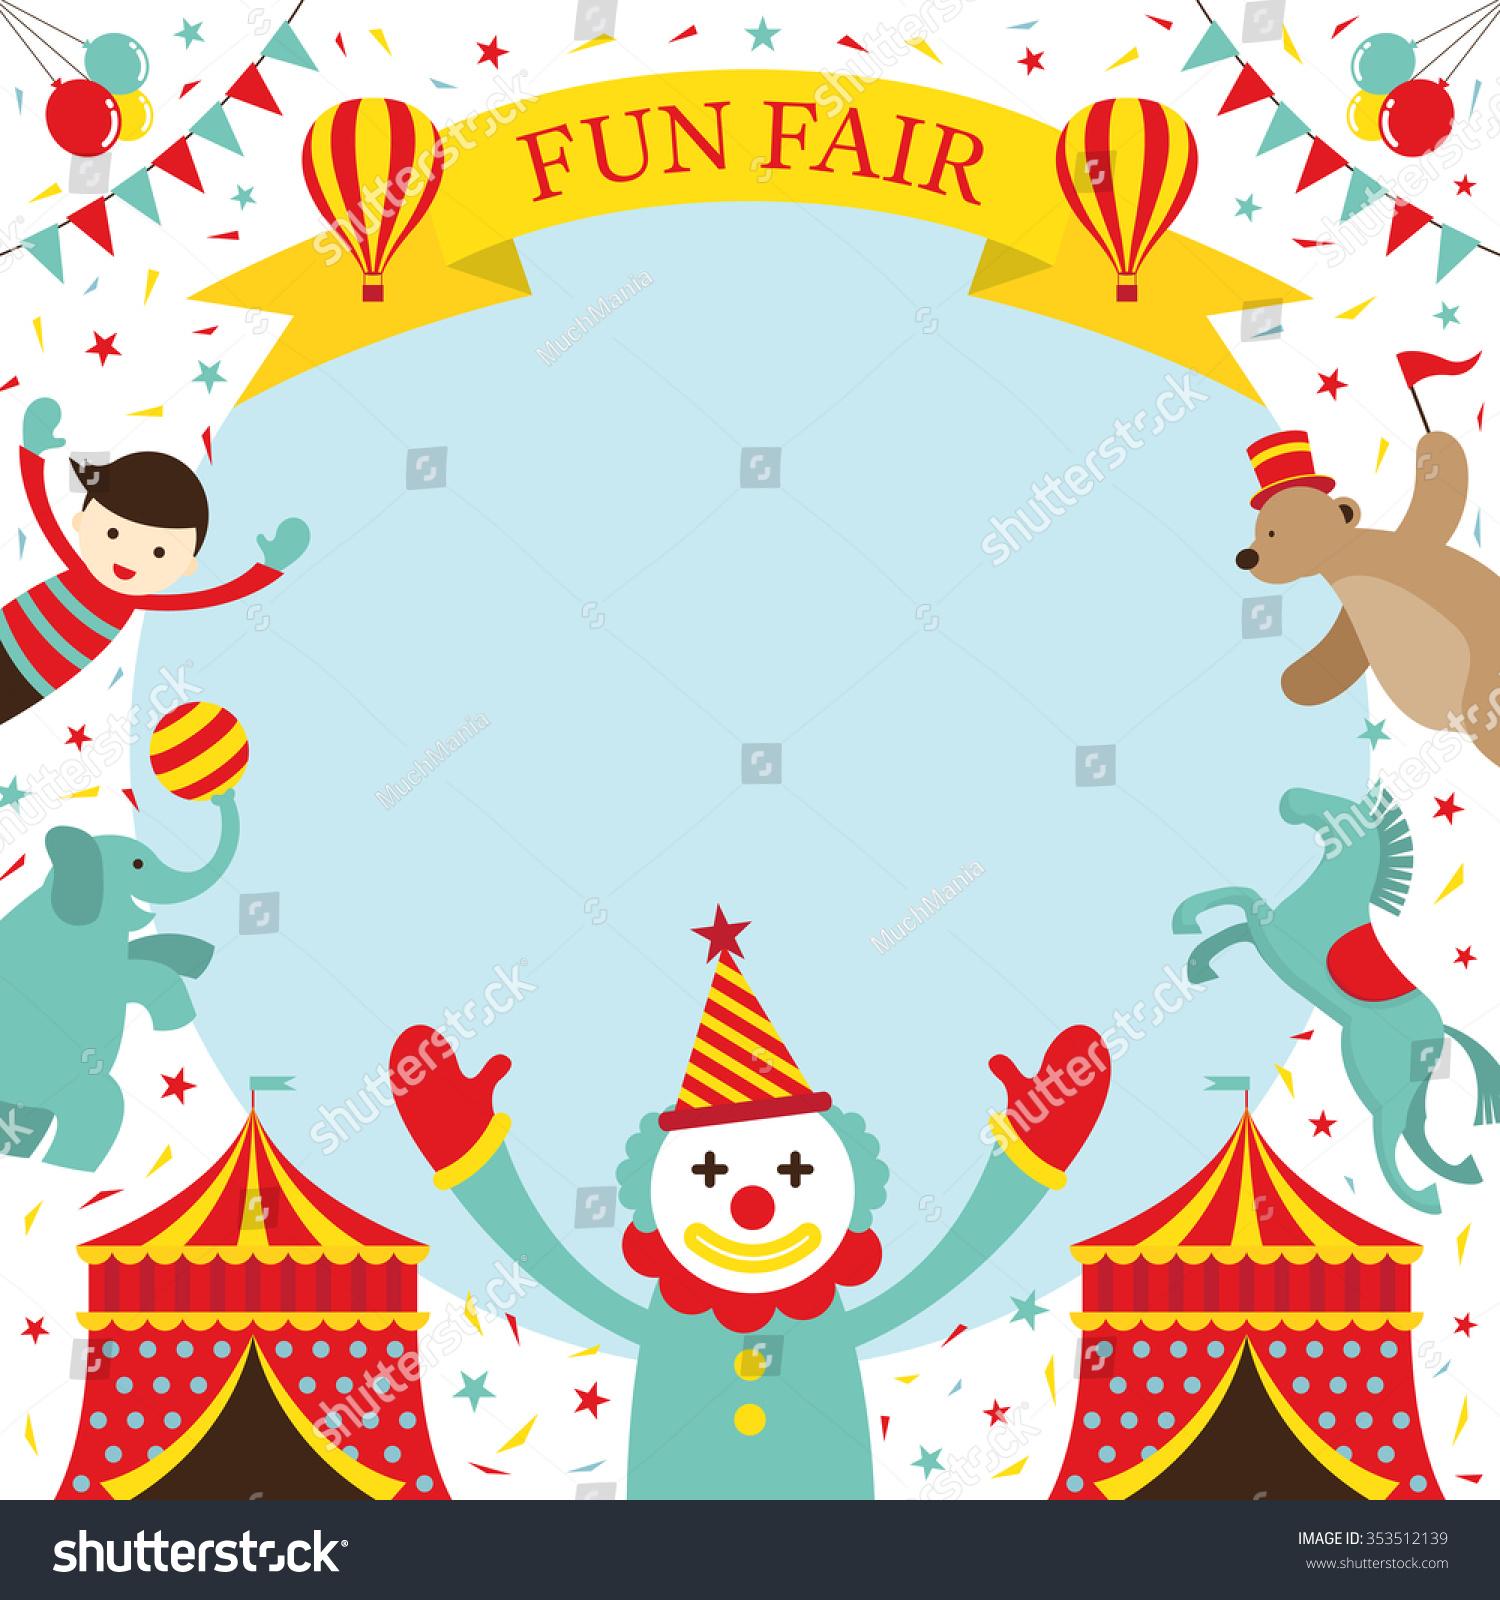 Fun Fair Carnival Circus Frame Amusement Stock Vector 353512139 ...